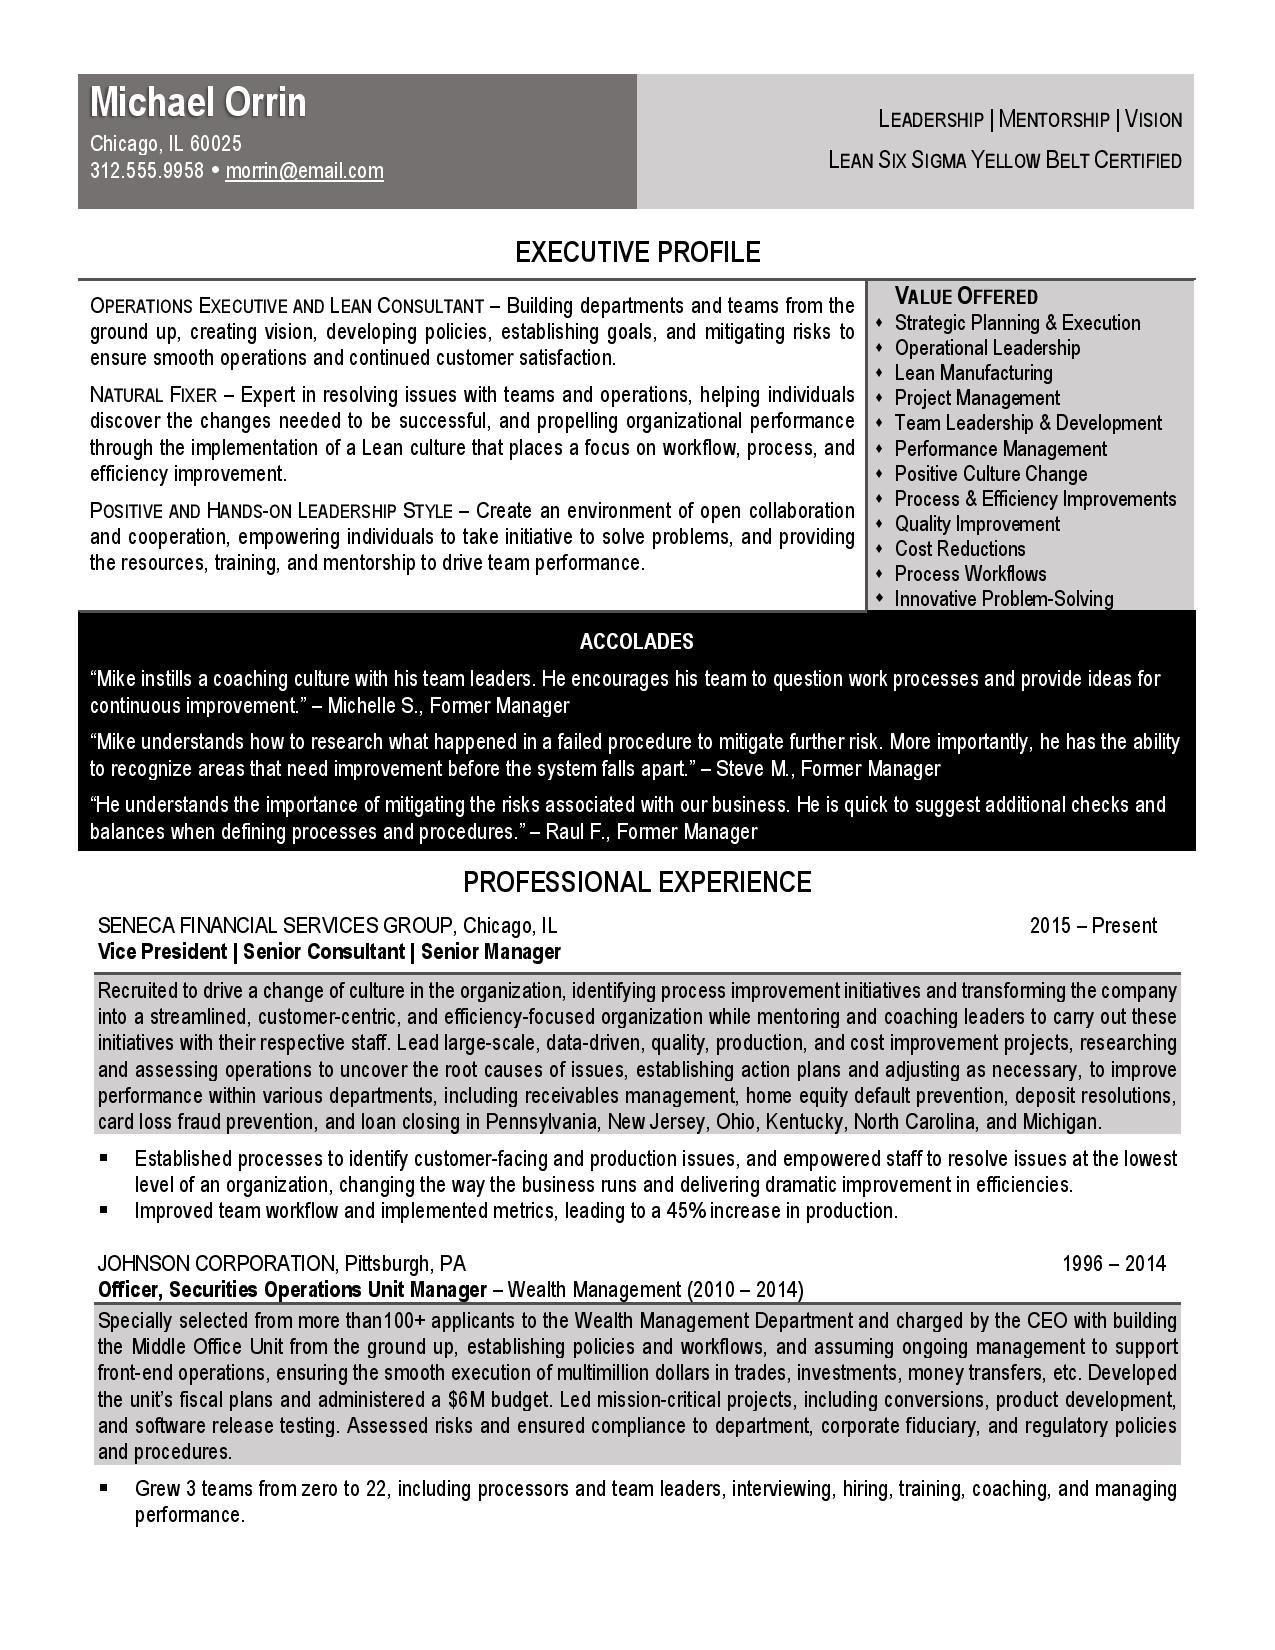 resume for lean consultant